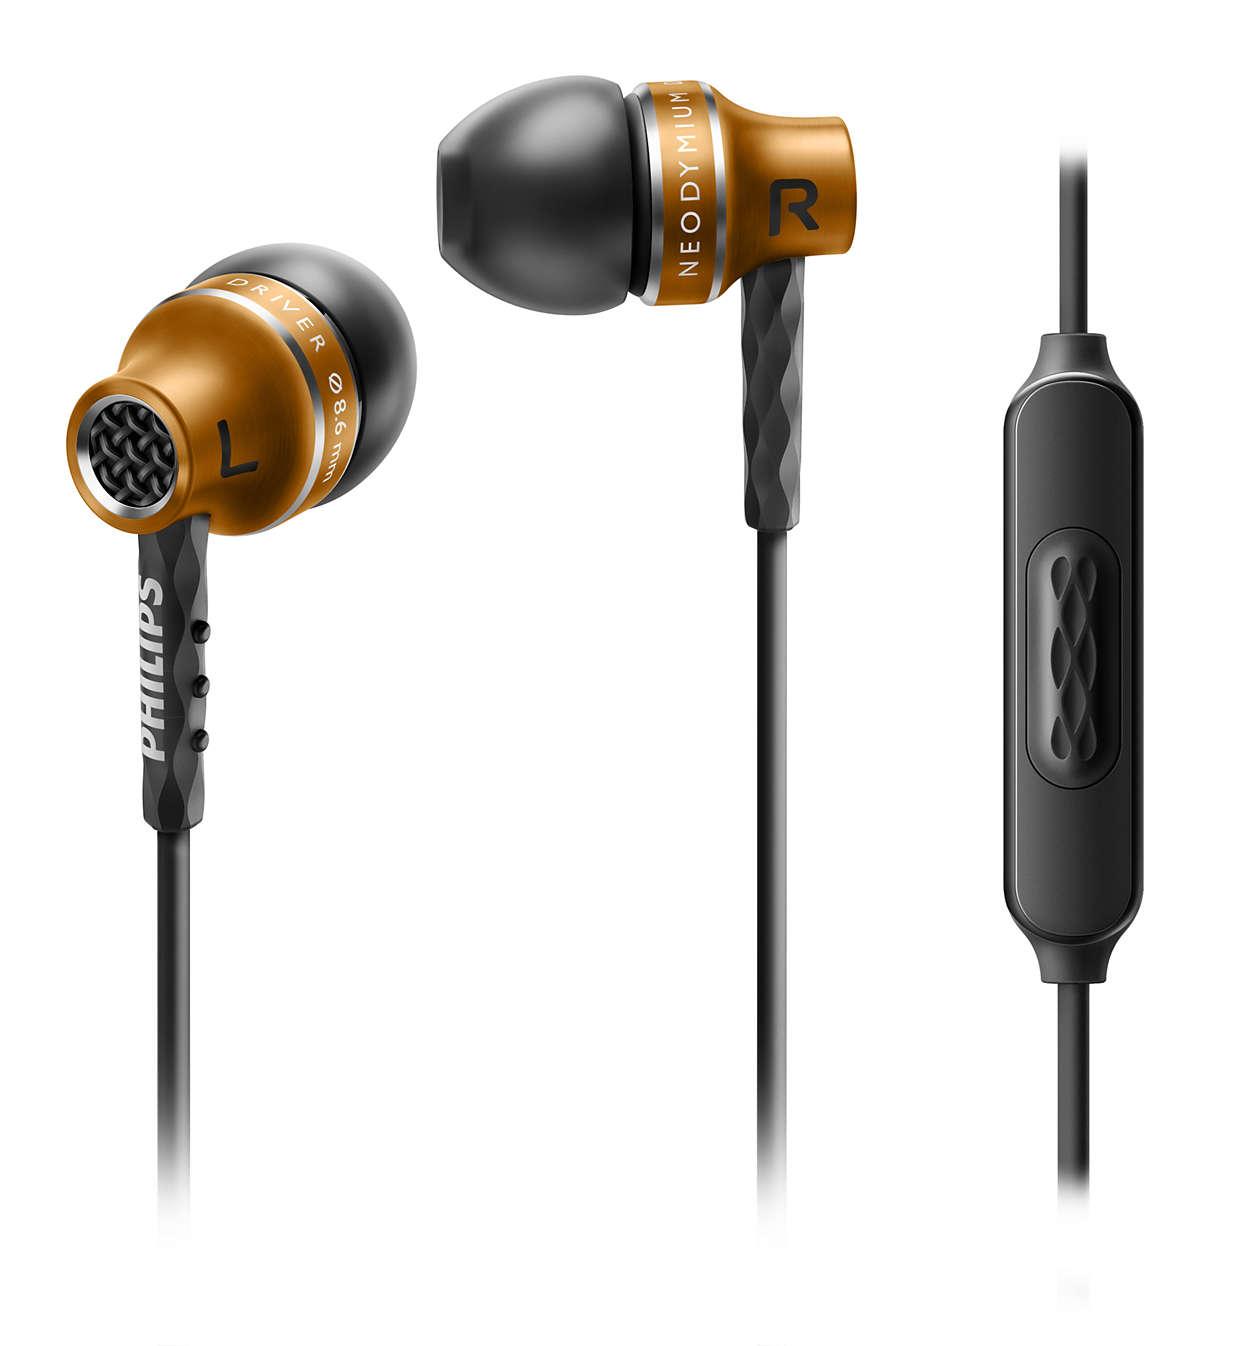 Enjoy high performance precision sound